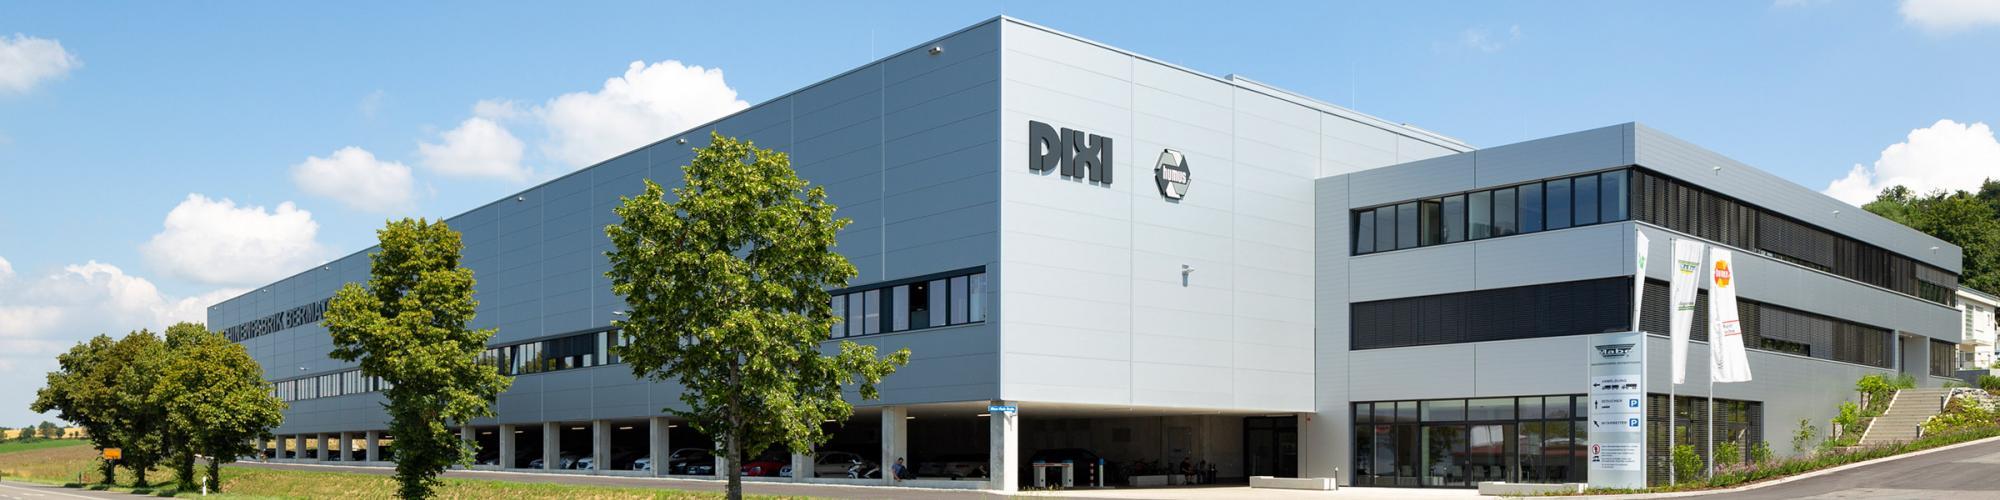 Maschinenfabrik Bermatingen GmbH & Co. KG